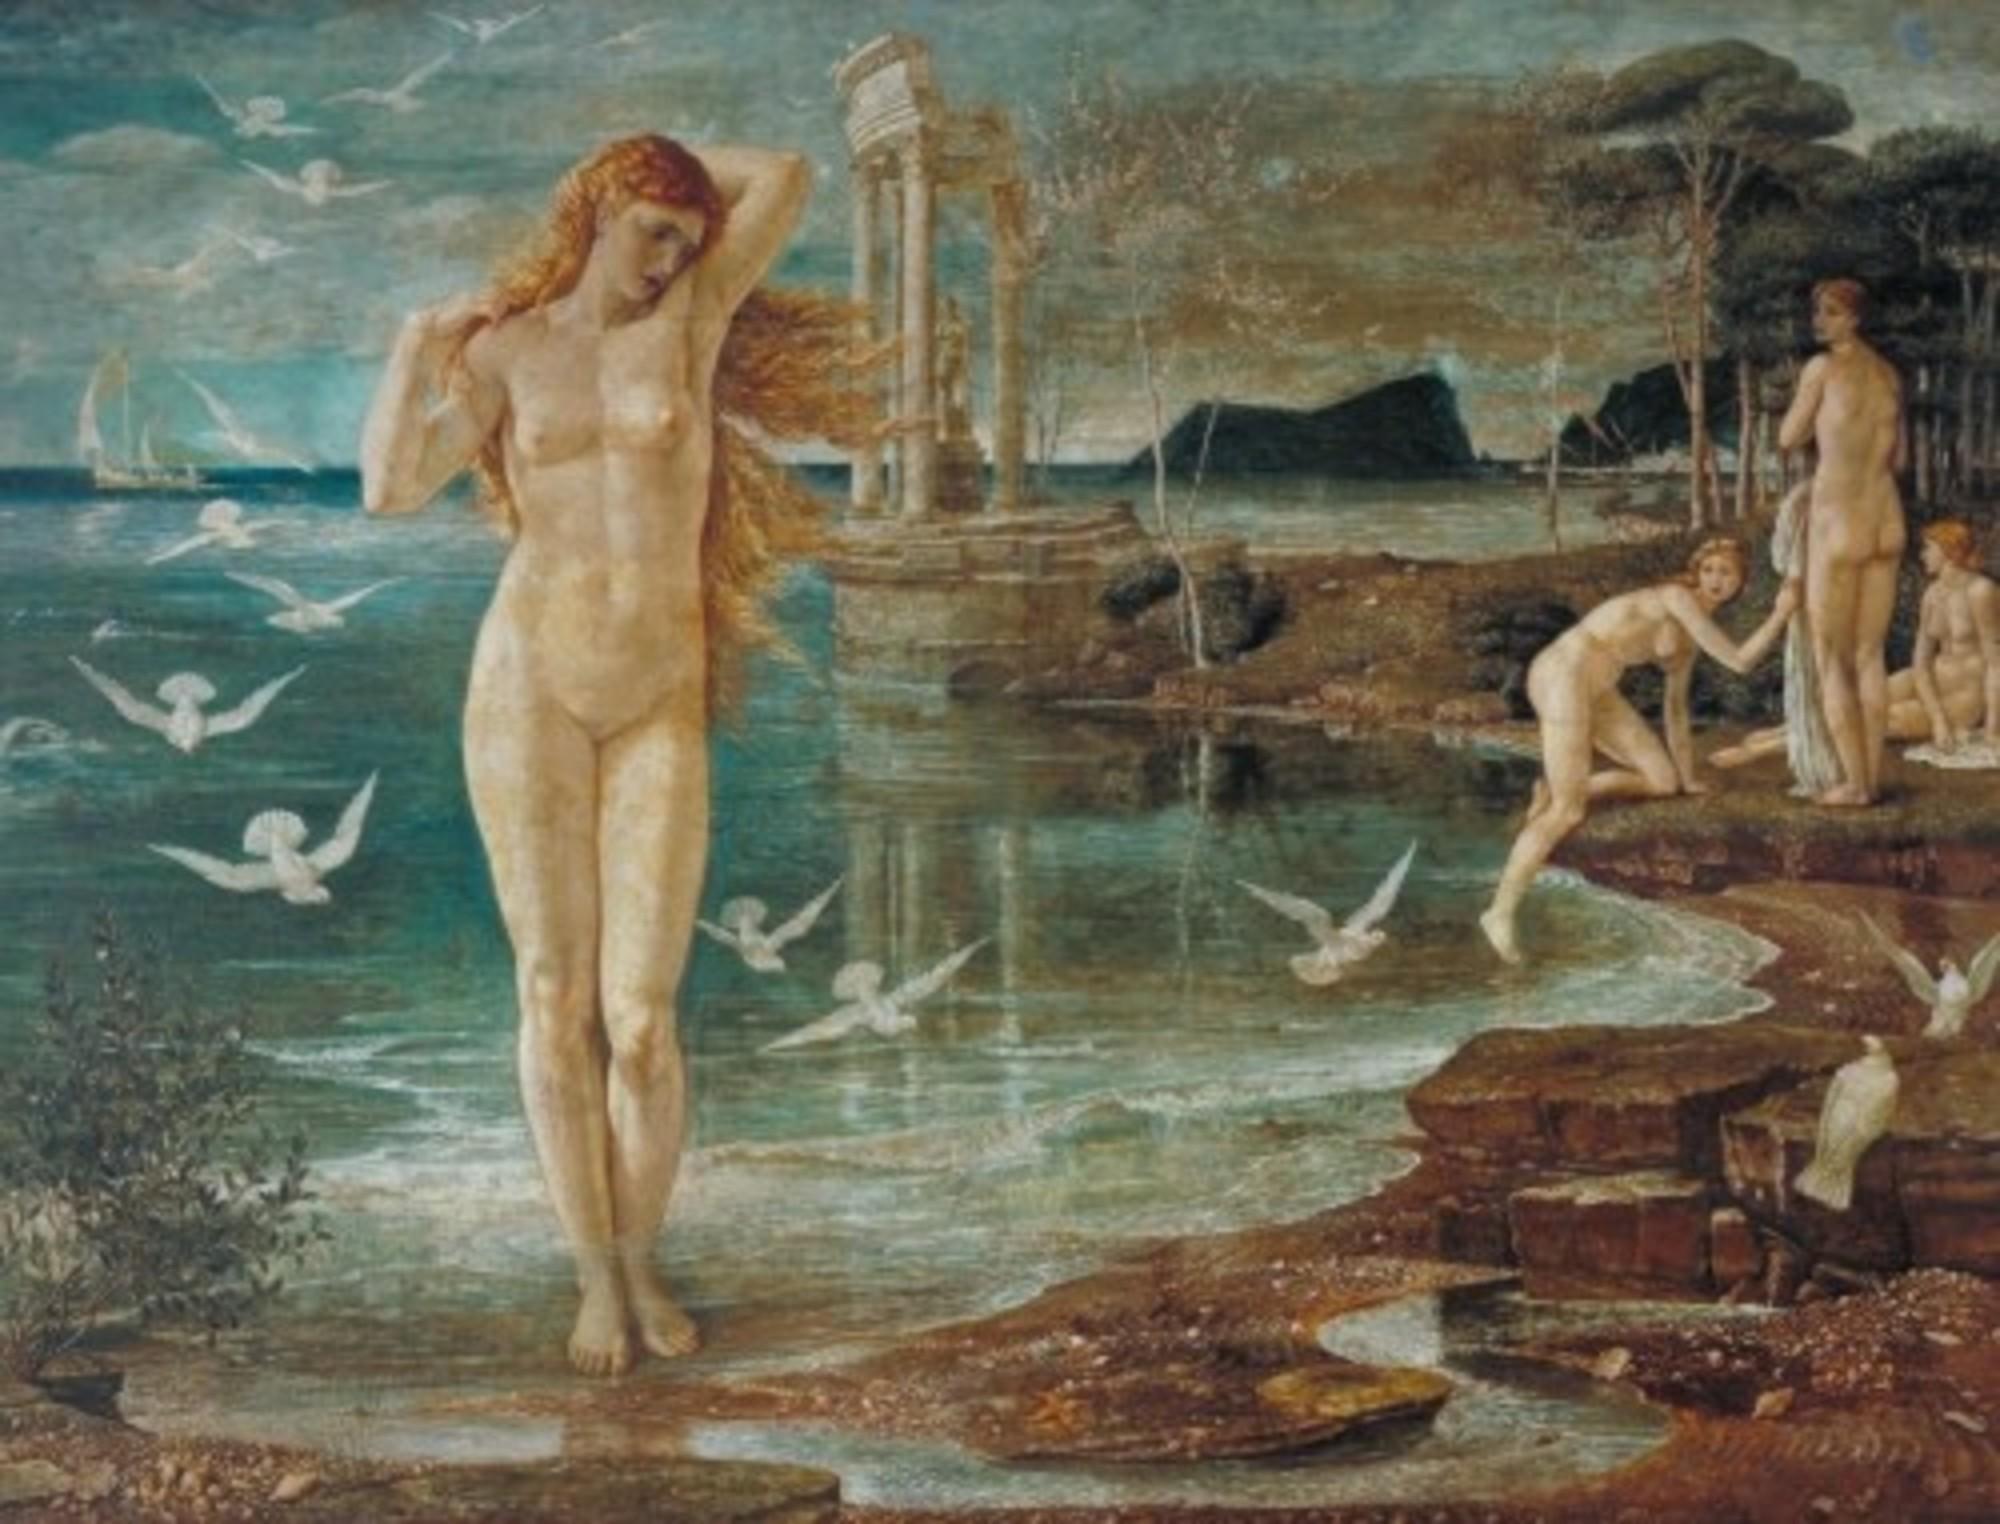 Walter-T.-Crane---The-Renaissance-of-Venus-1877.jpg